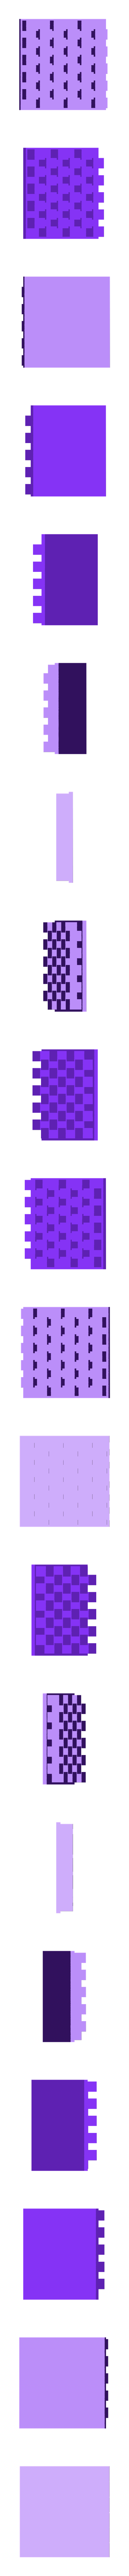 Cuadrados 1.stl Download free STL file Texture of squares • 3D printing model, Agos3D